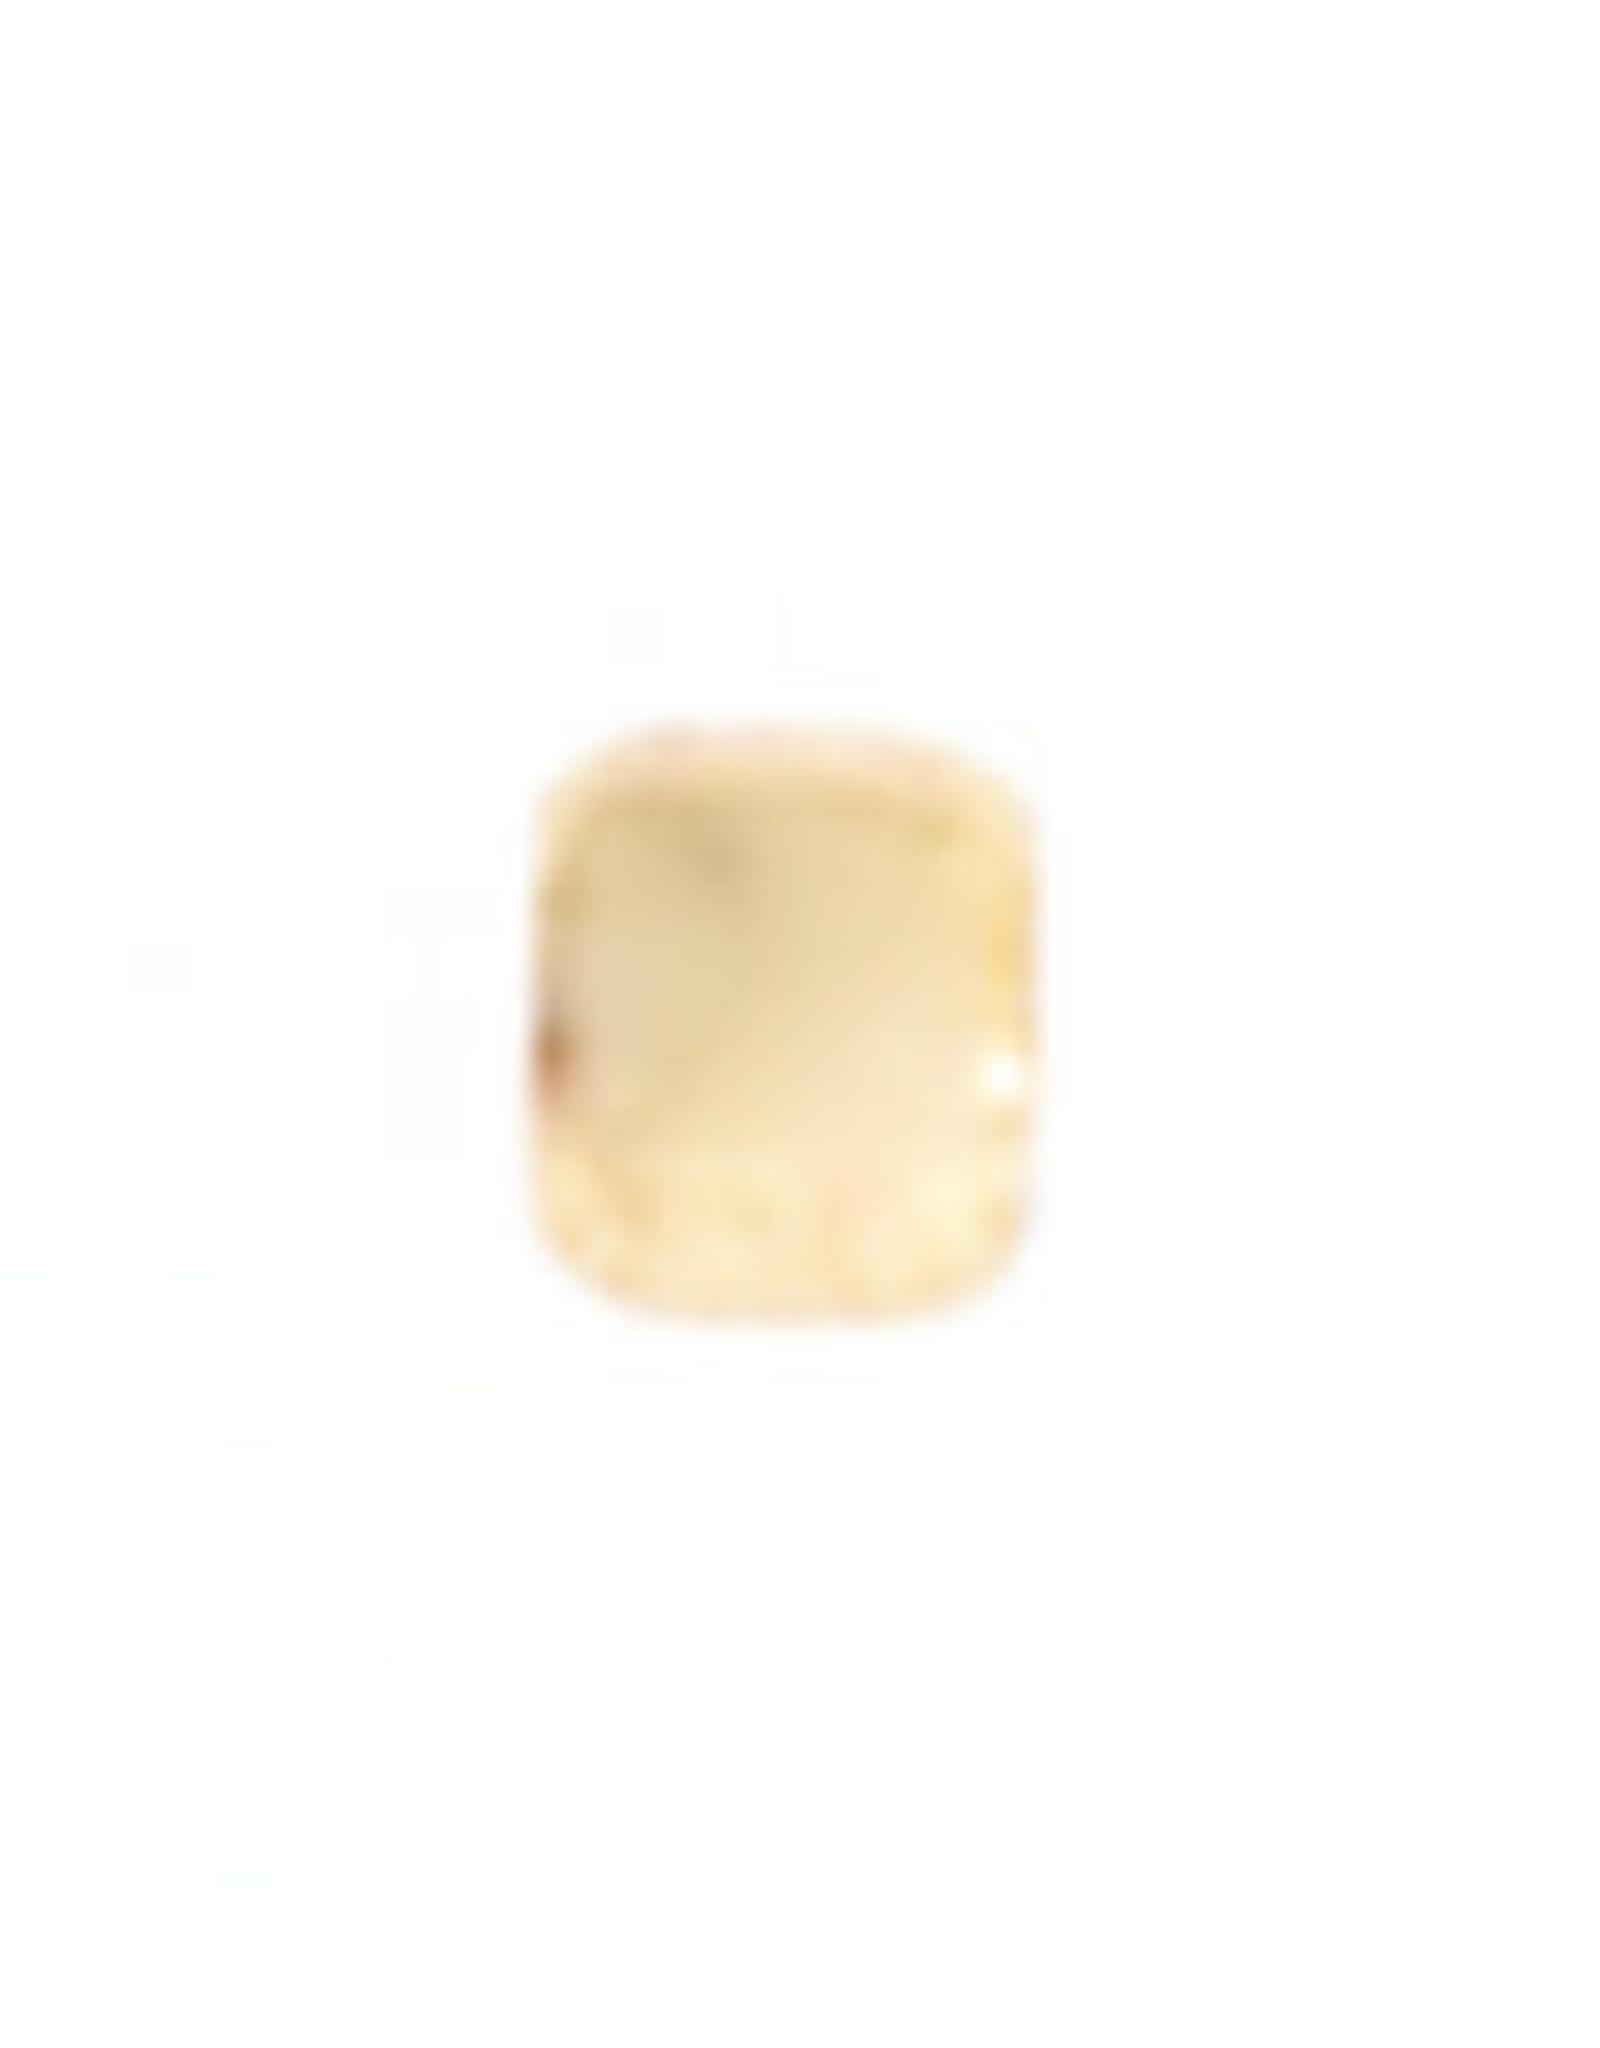 Crimp Bead Smooth 2mm Gold (1000 pcs)